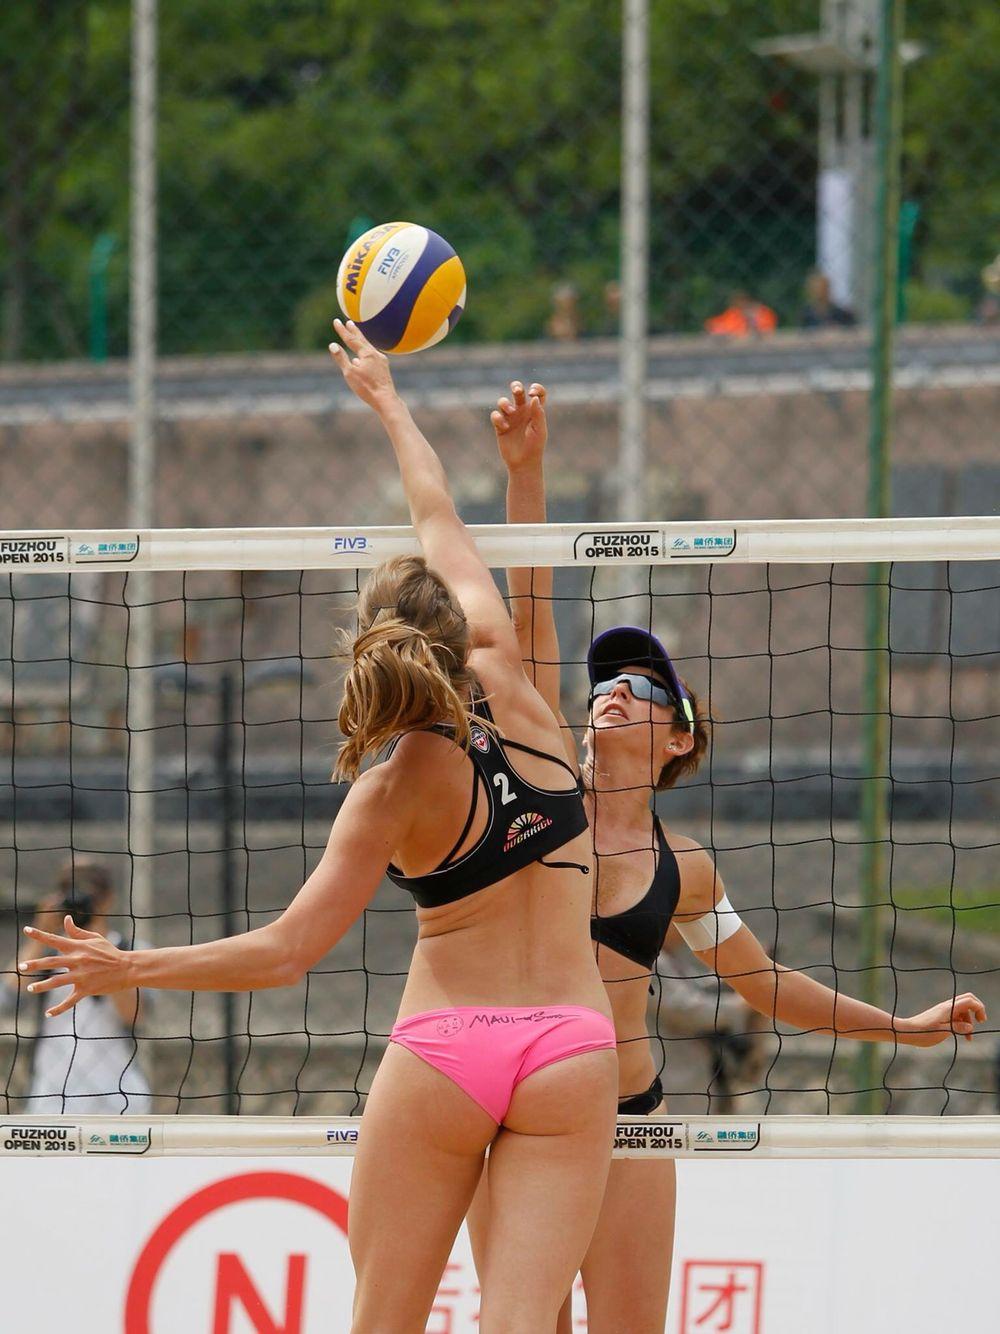 Taylor Pishcke Beach Volleyball Swimwear Workout